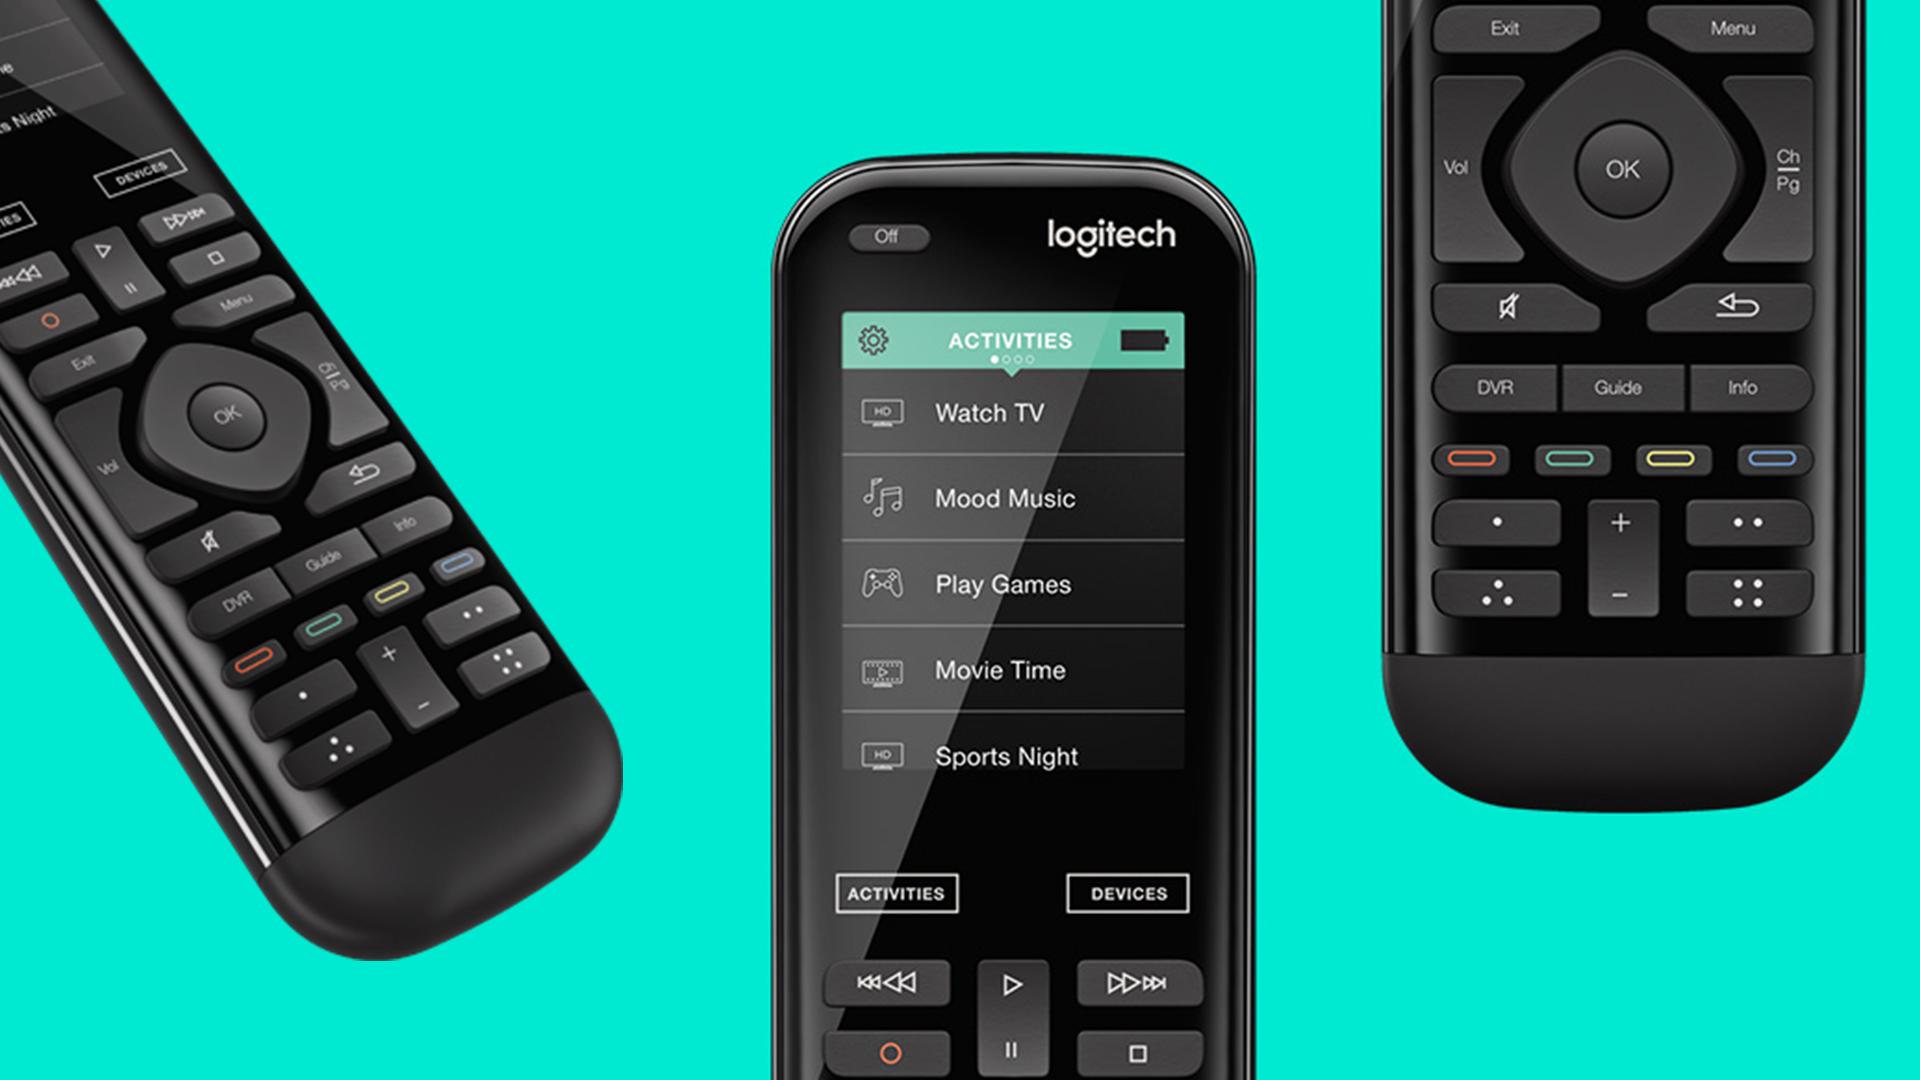 Top 10 Smart Home Gadgets 2019 - Logitech Harmony 950 (DigitaleWelt)